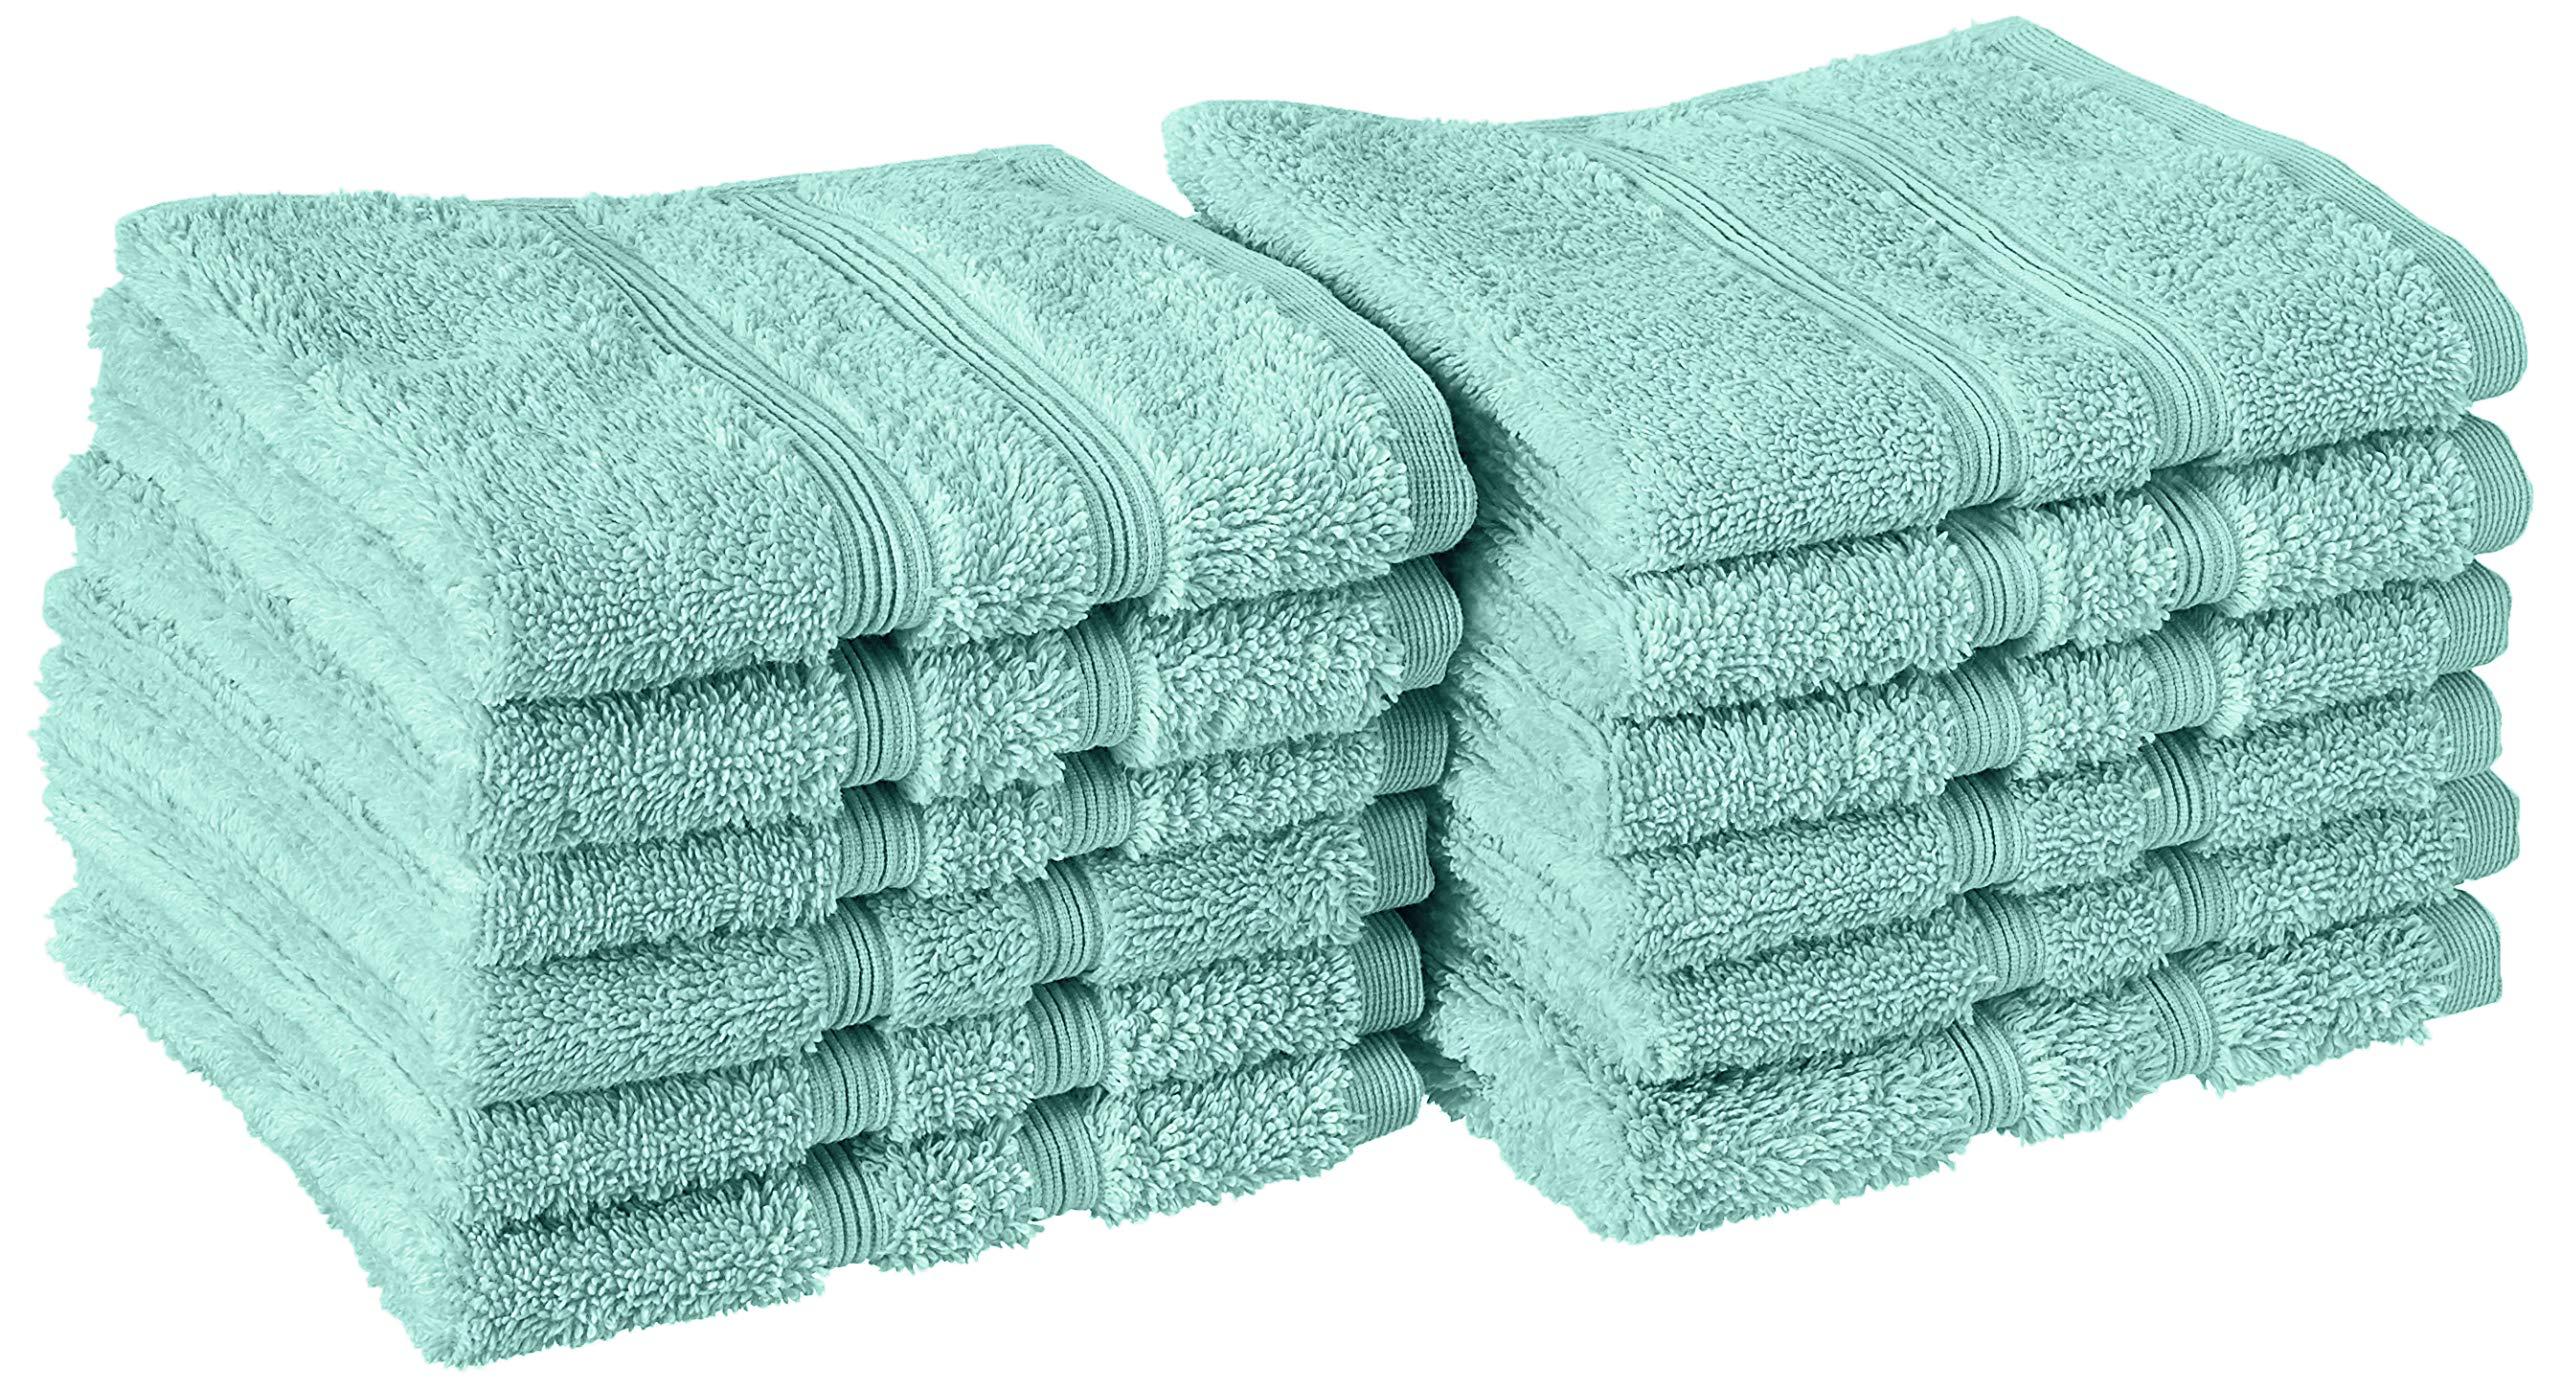 Manor Ridge Turkish Cotton 700 GSM Wash Cloth Set, Super Soft, Heavy Weight & Absorbent, 12-Pack, Aqua 12 Count